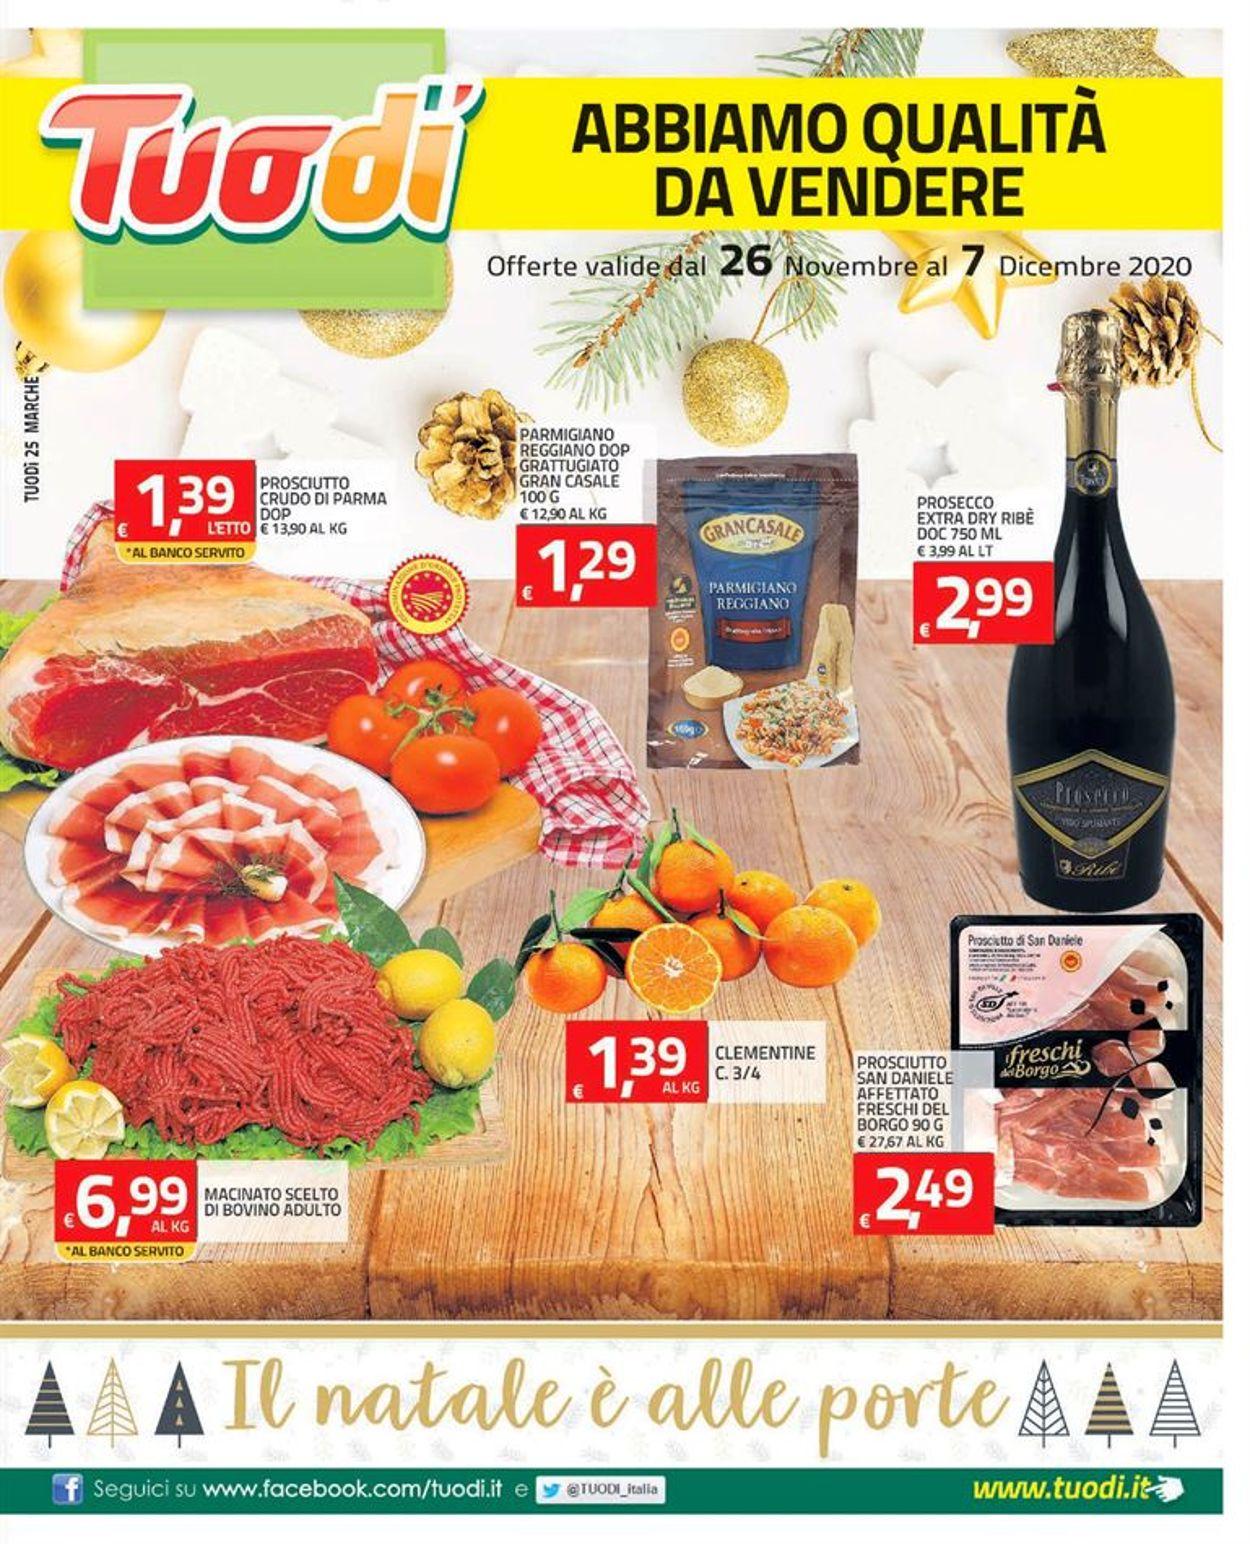 Volantino Tuodi - Black Friday 2020 - Offerte 26/11-07/12/2020